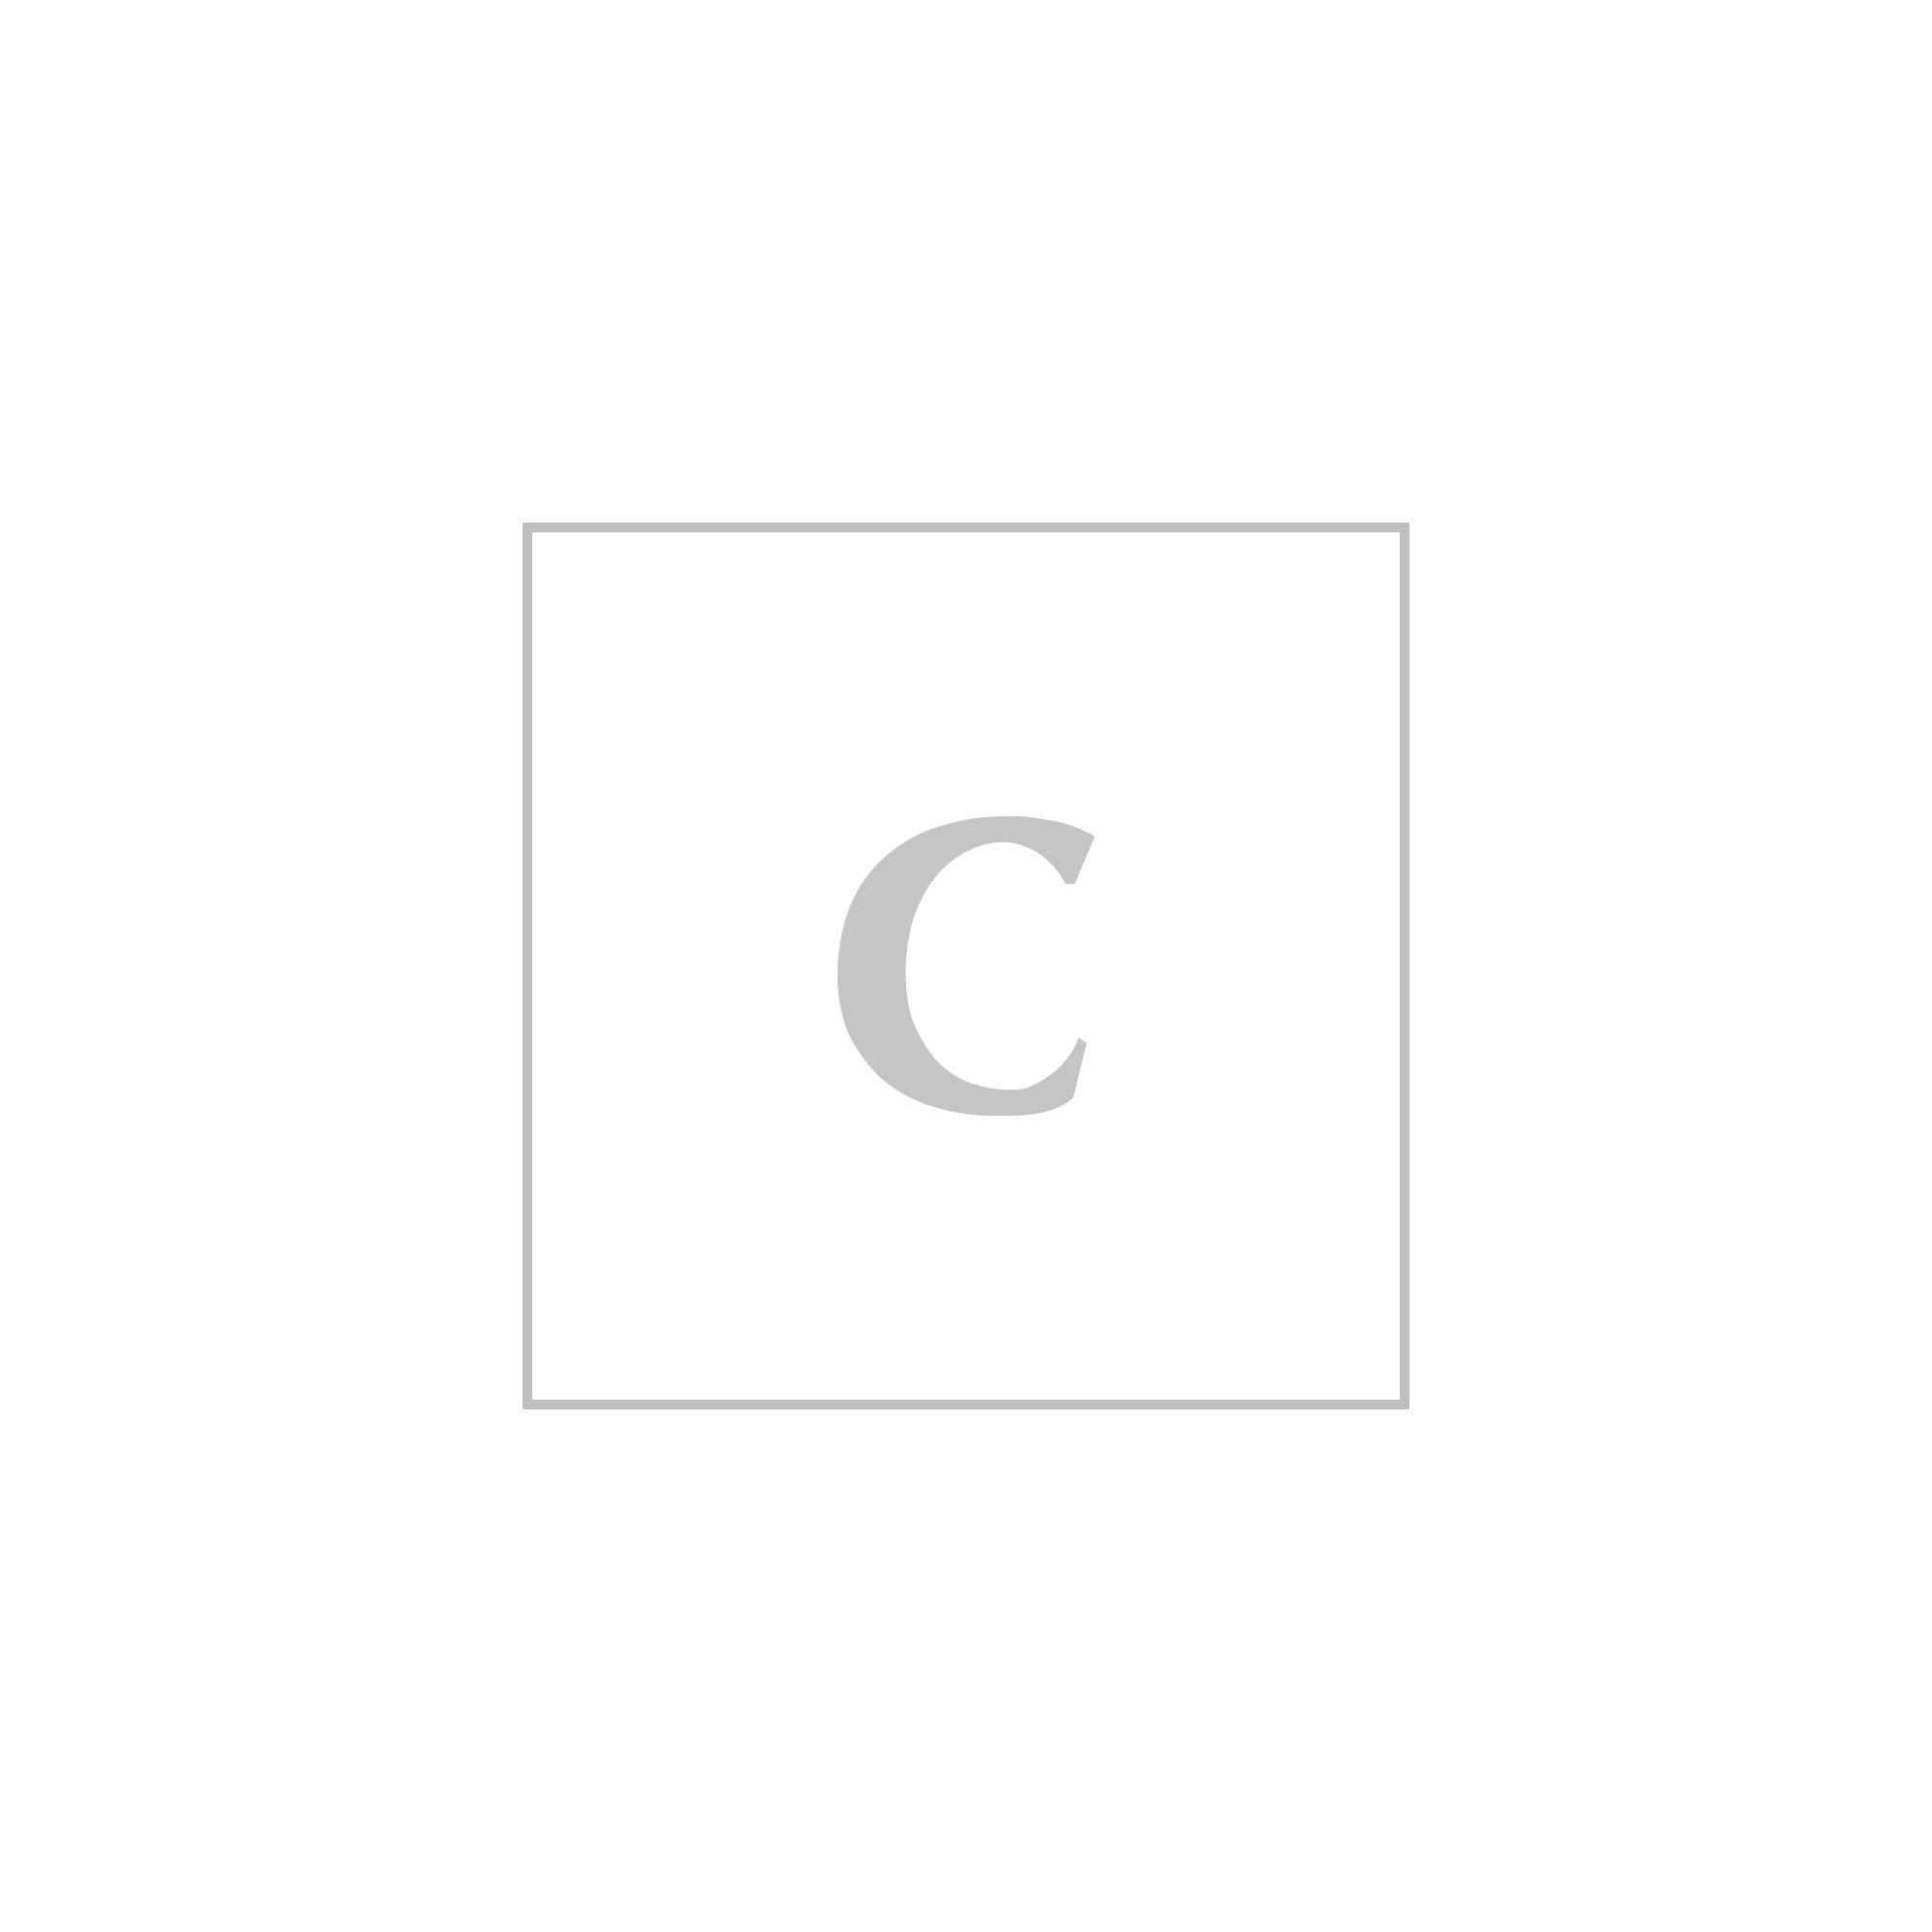 burberry abbigliamento donna felpa fairhall con logo